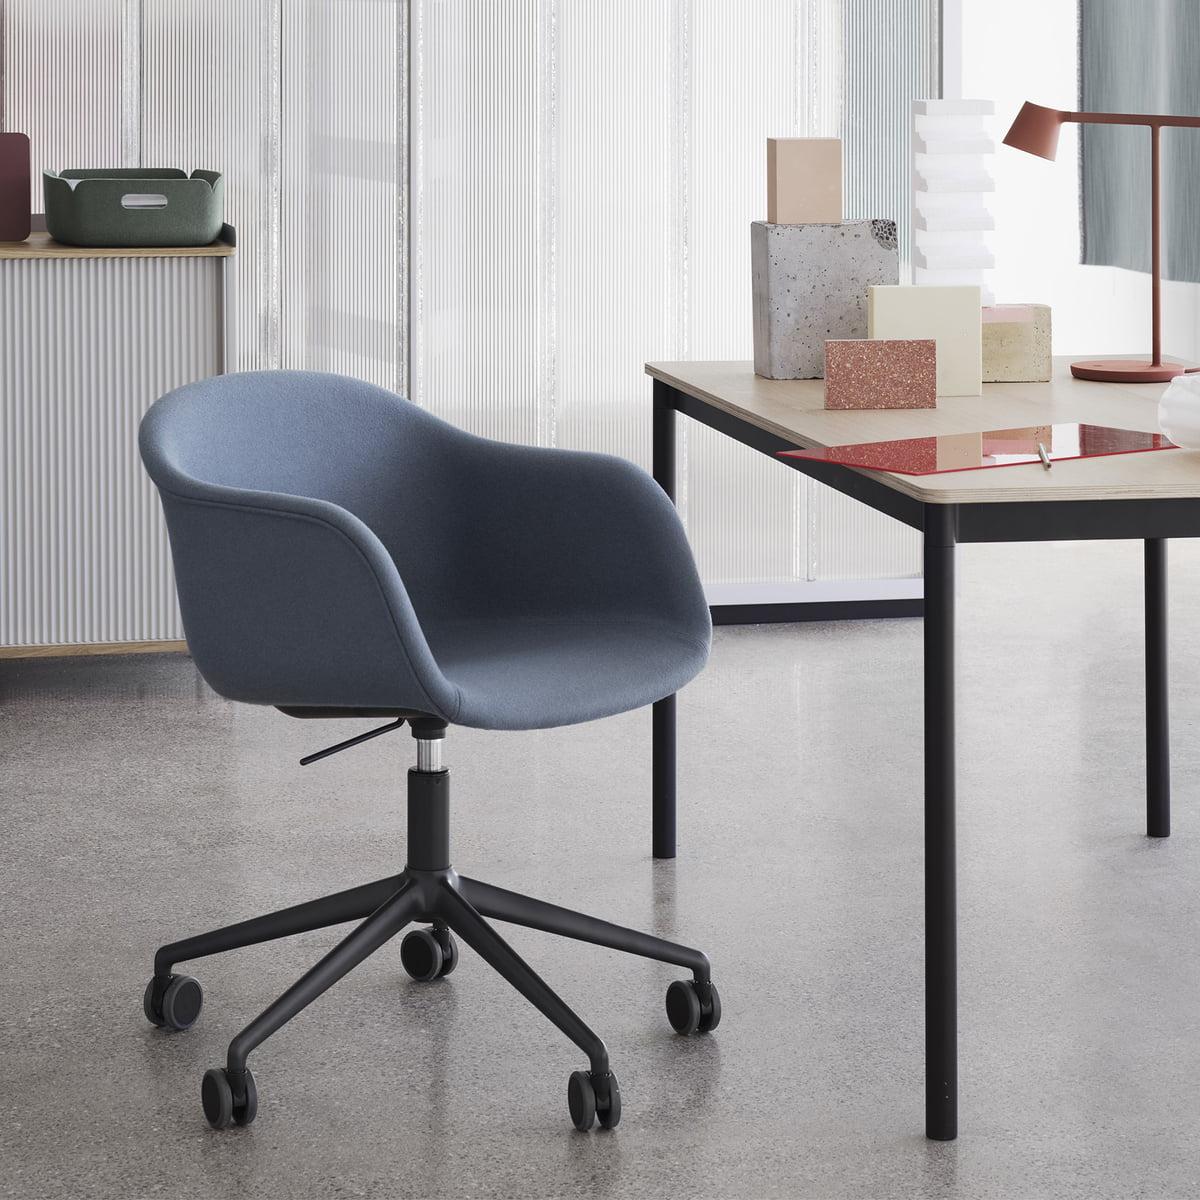 Fiber Büro-Armlehnstuhl Swivel Base von Muuto   Connox